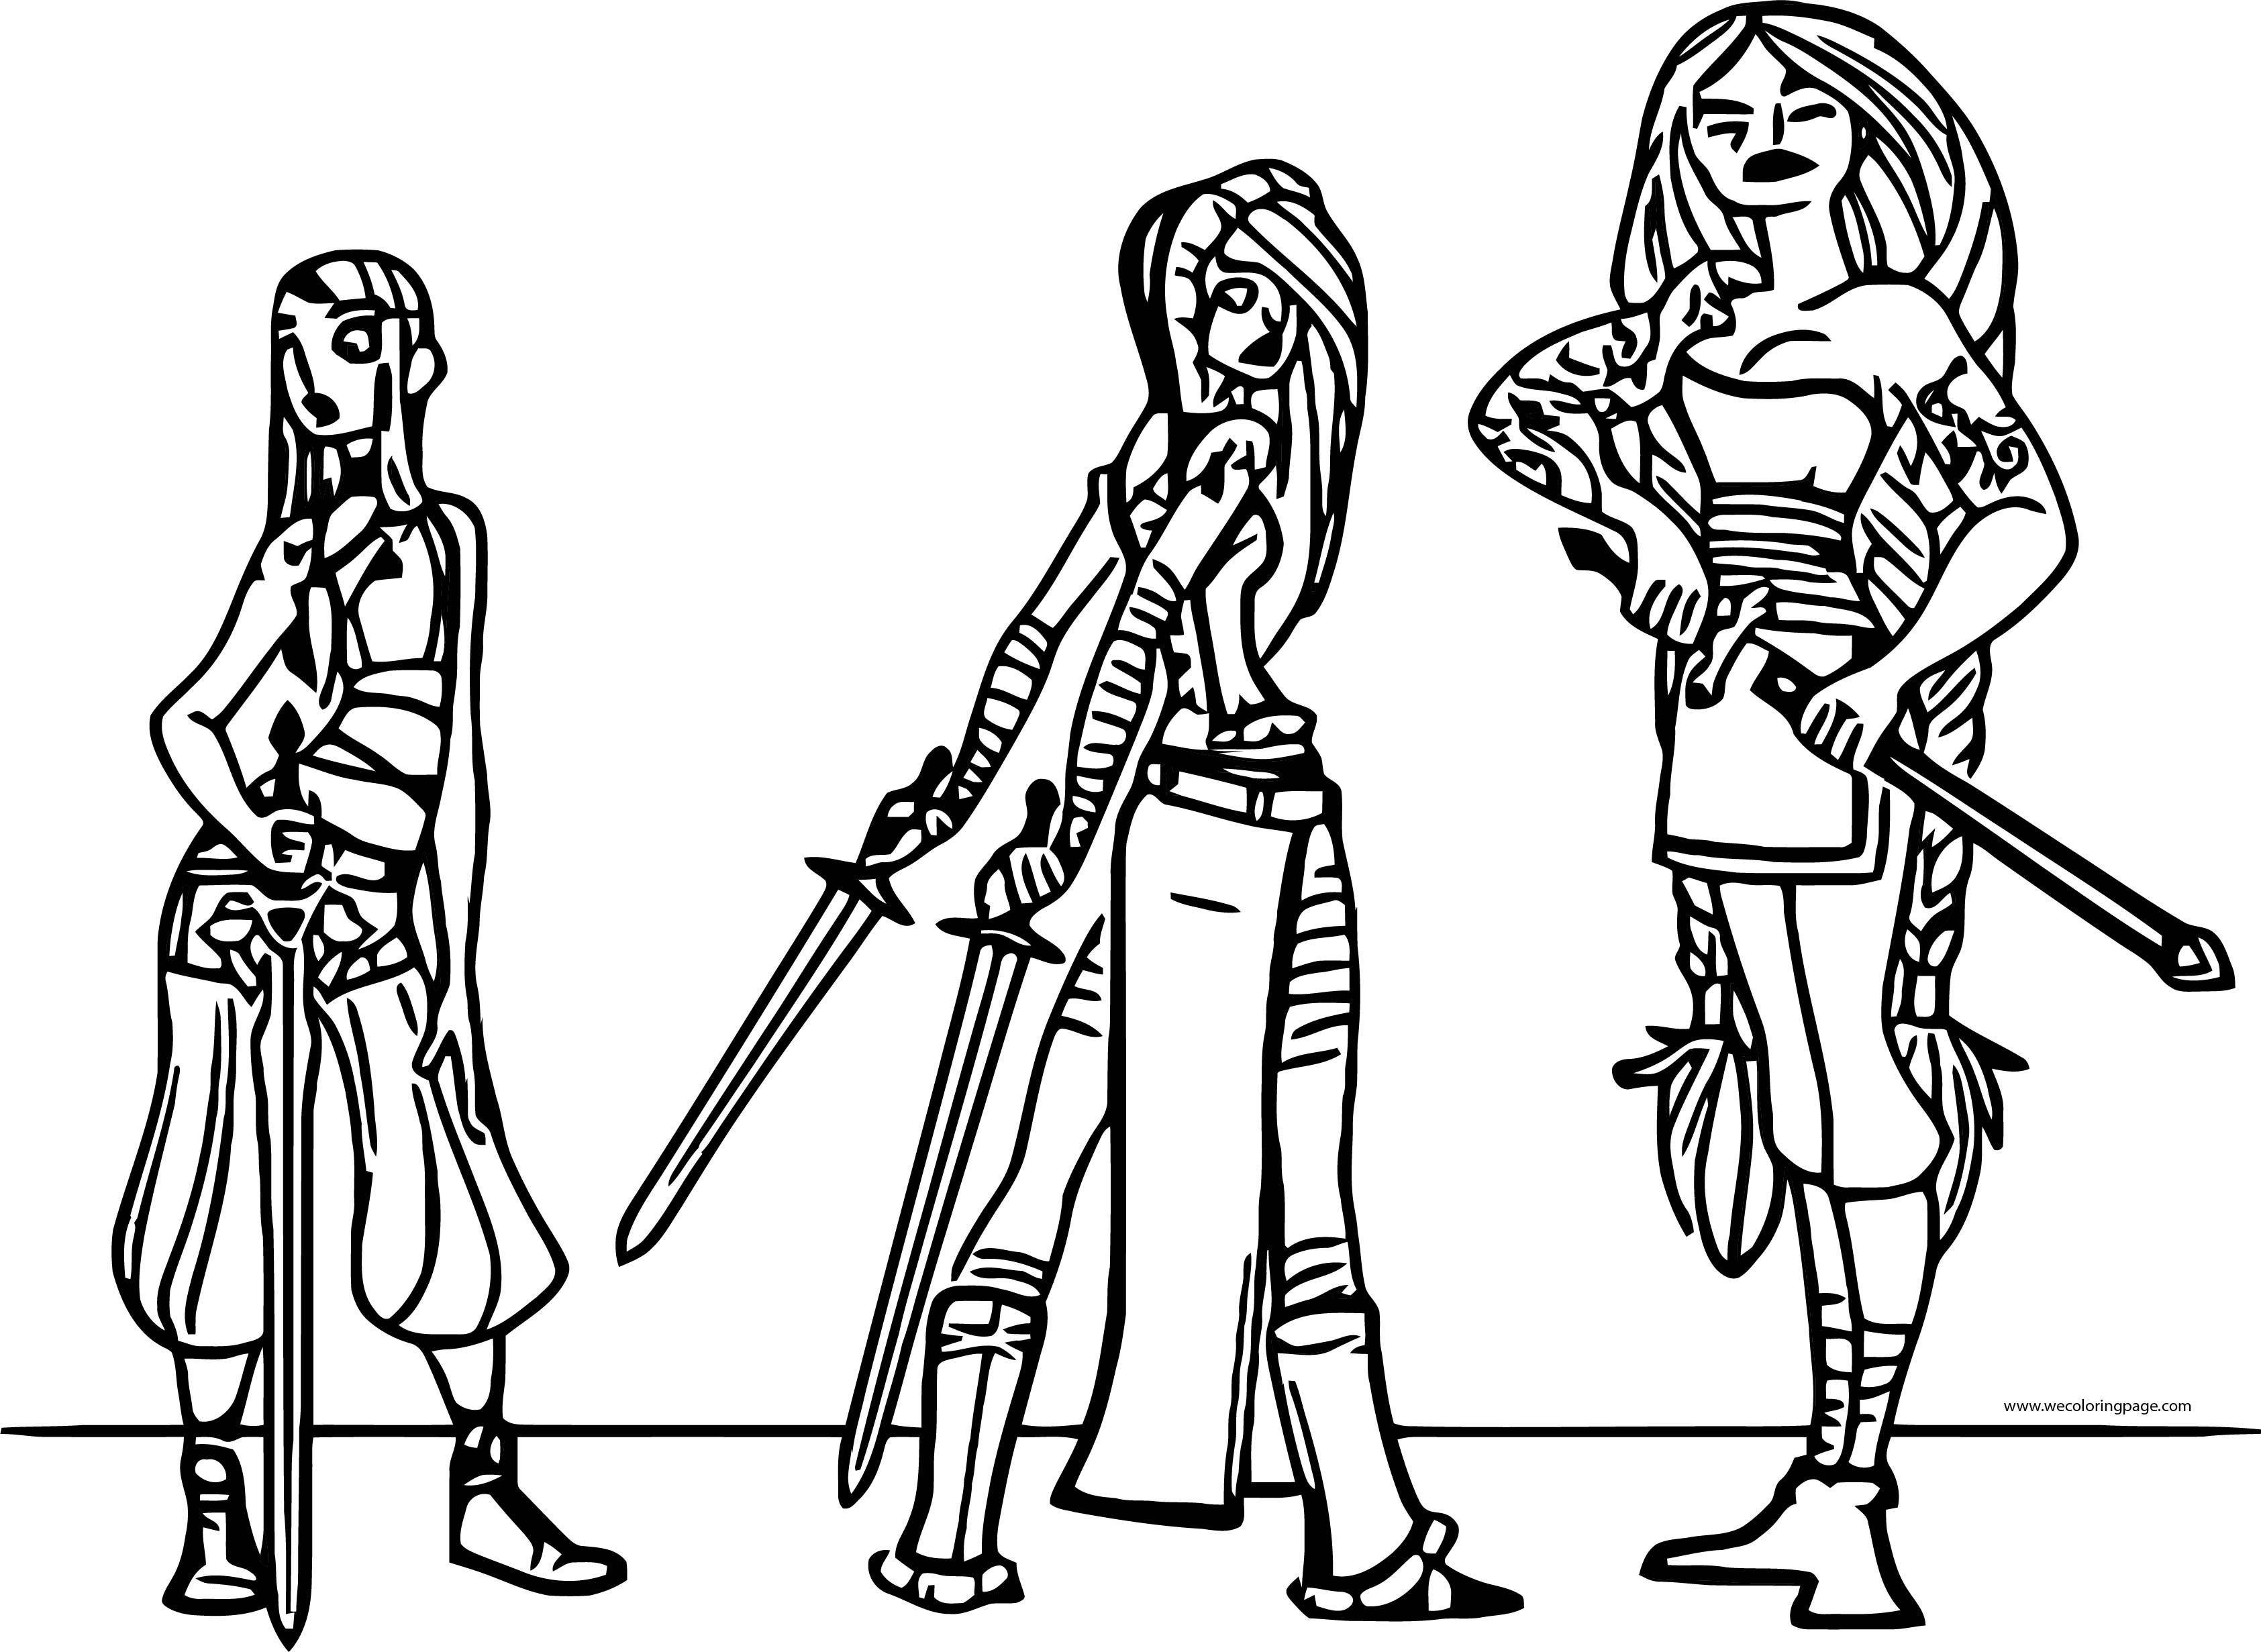 Character Design Clara The Sword Viking Coloring Page